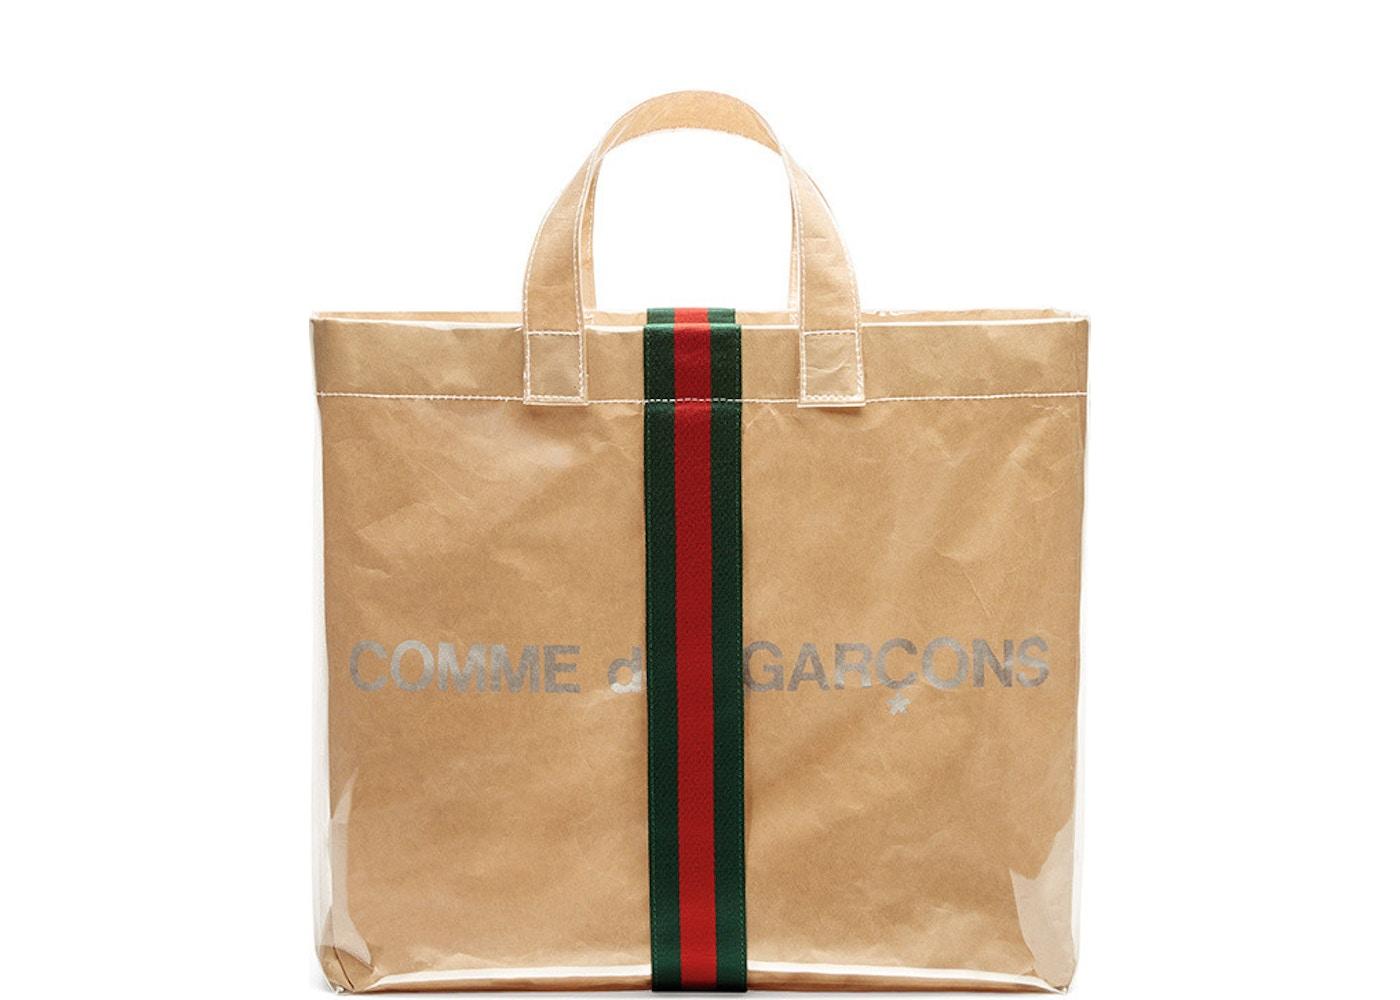 6f3695dfa Gucci x Comme des Garcons Tote Plastic Clear